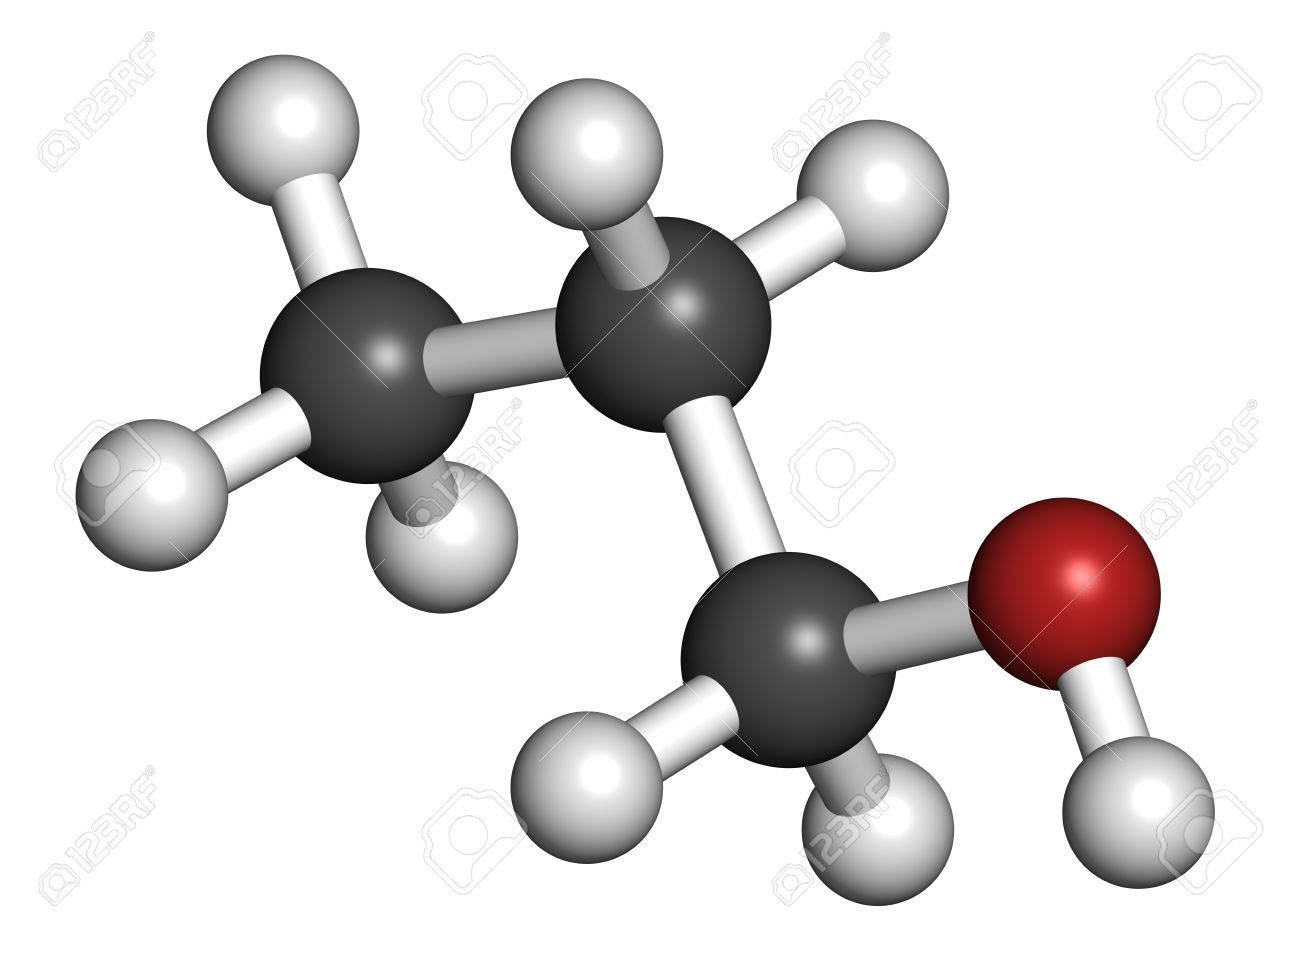 N Propanol Propanol  n-propanol  solvent